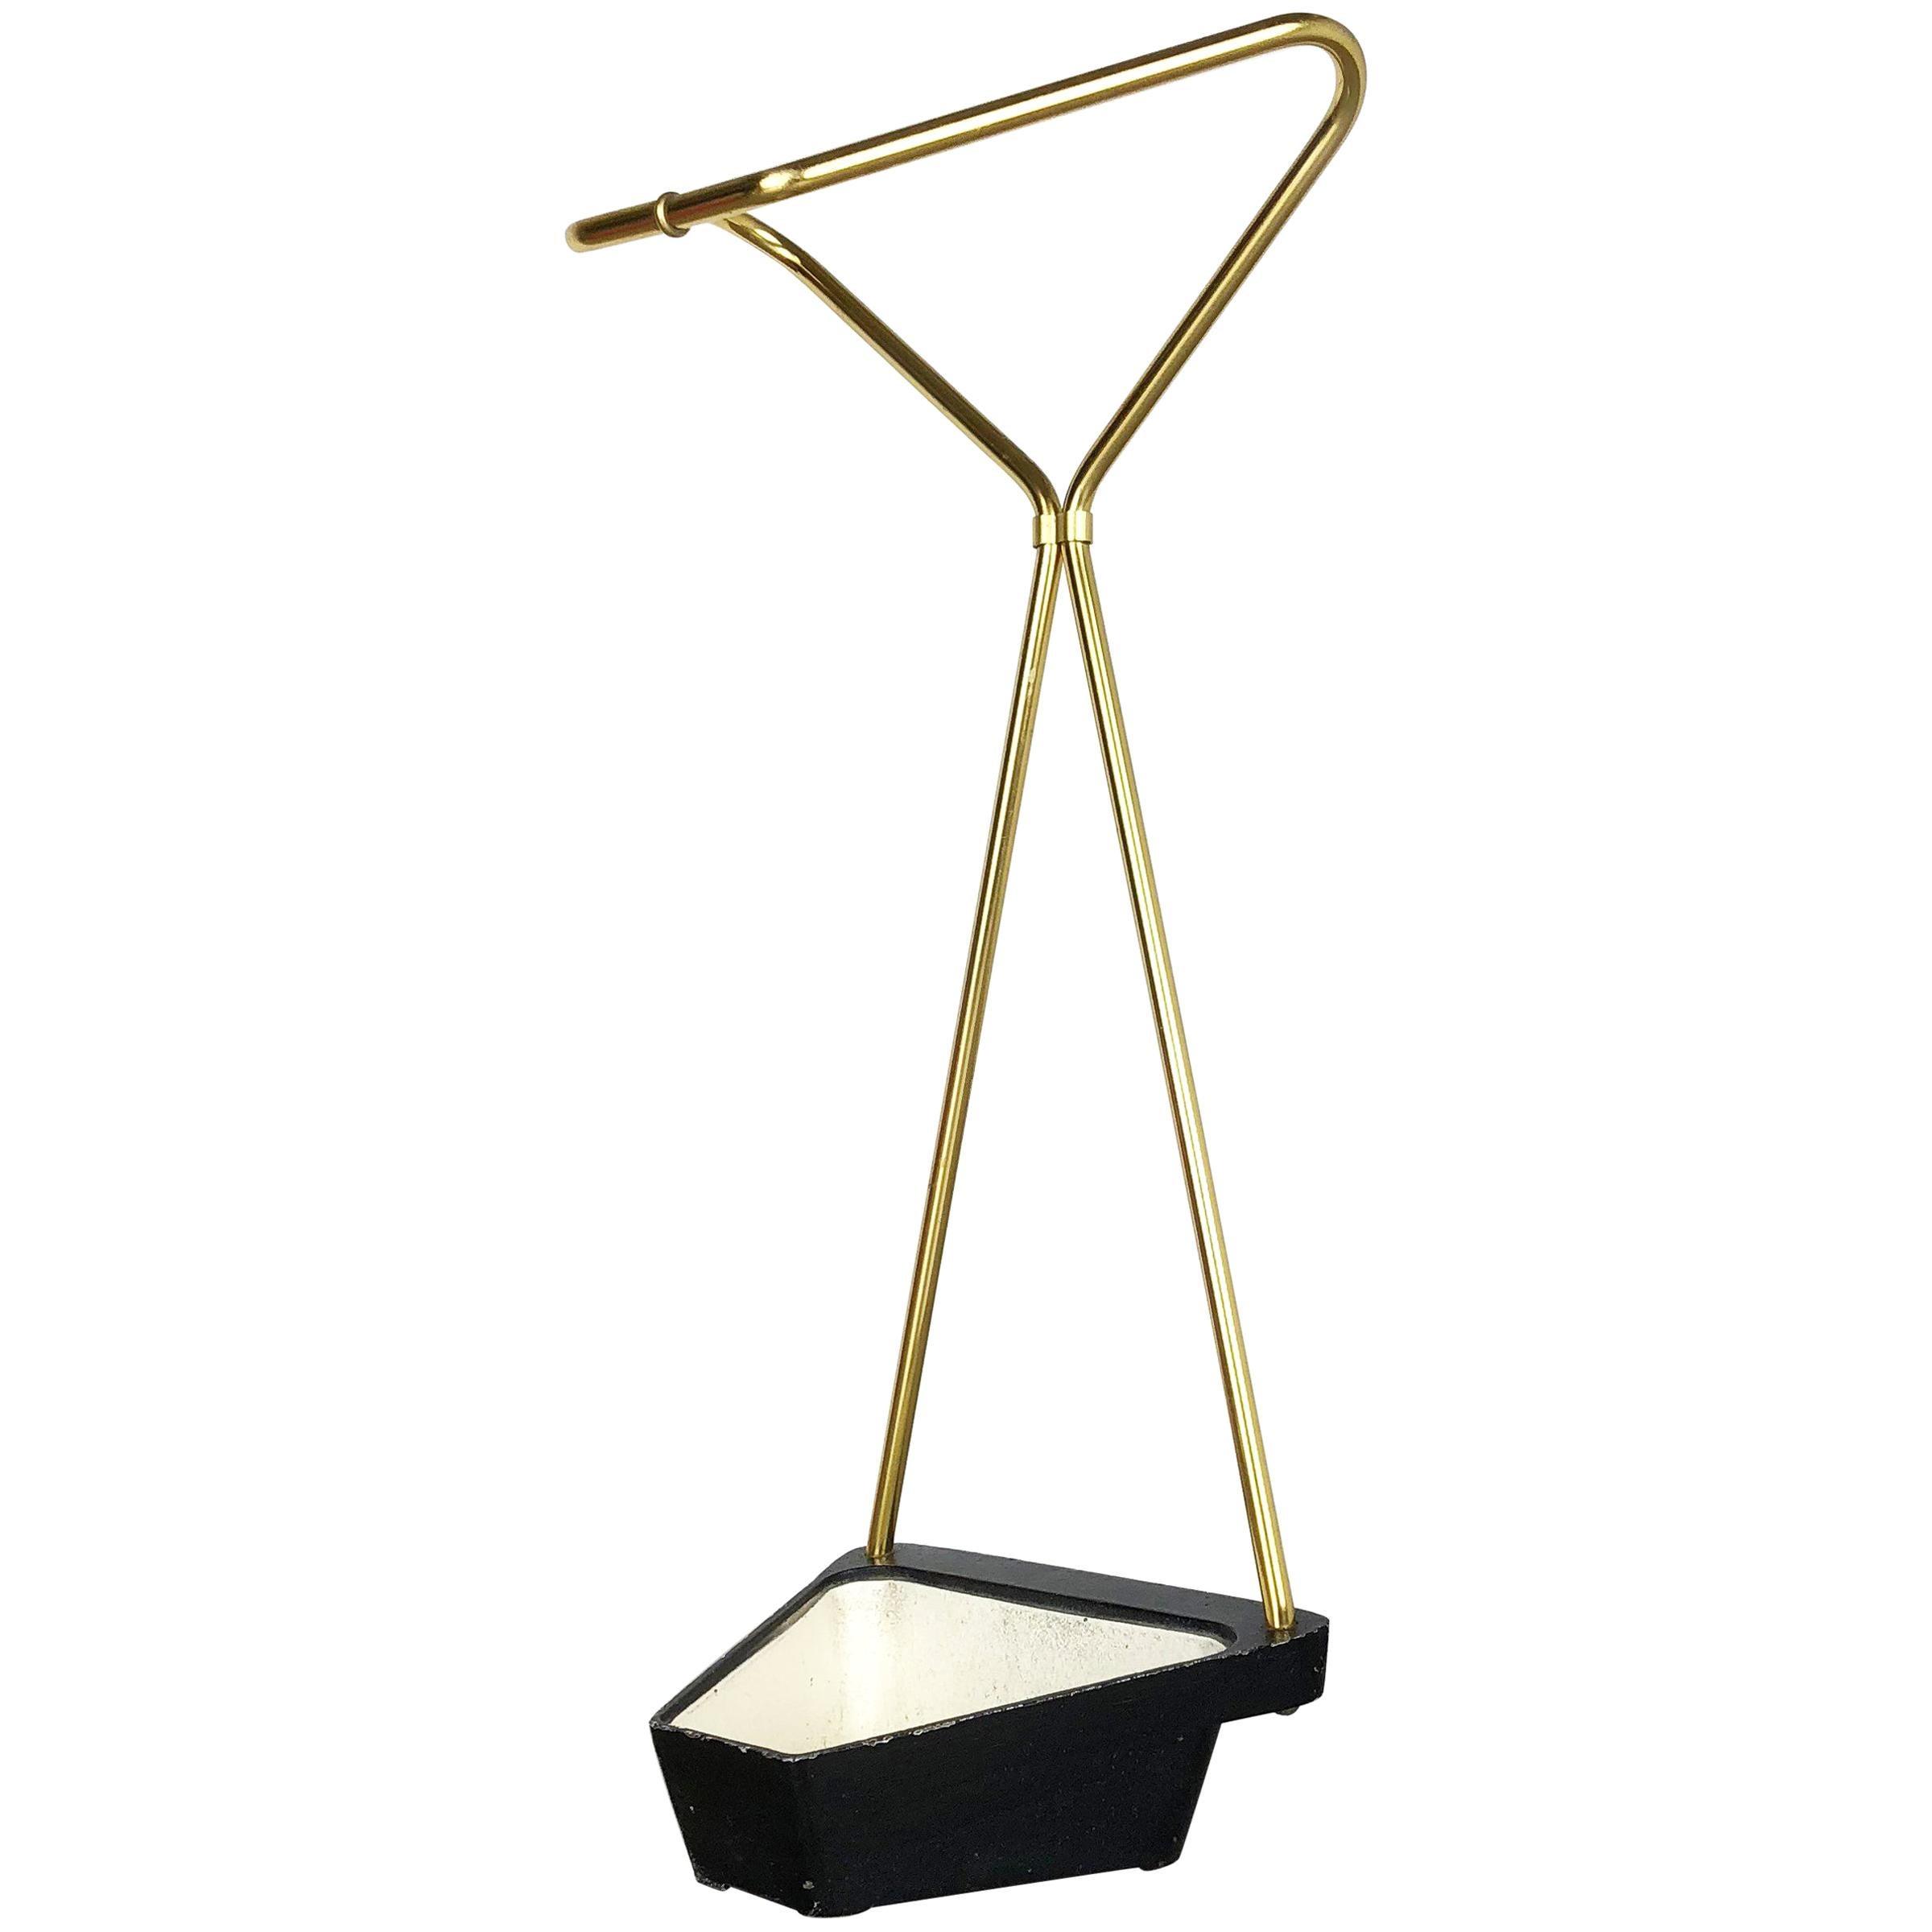 Midcentury Metal Brass Umbrella Stand, Germany, 1950s, Nr. 1